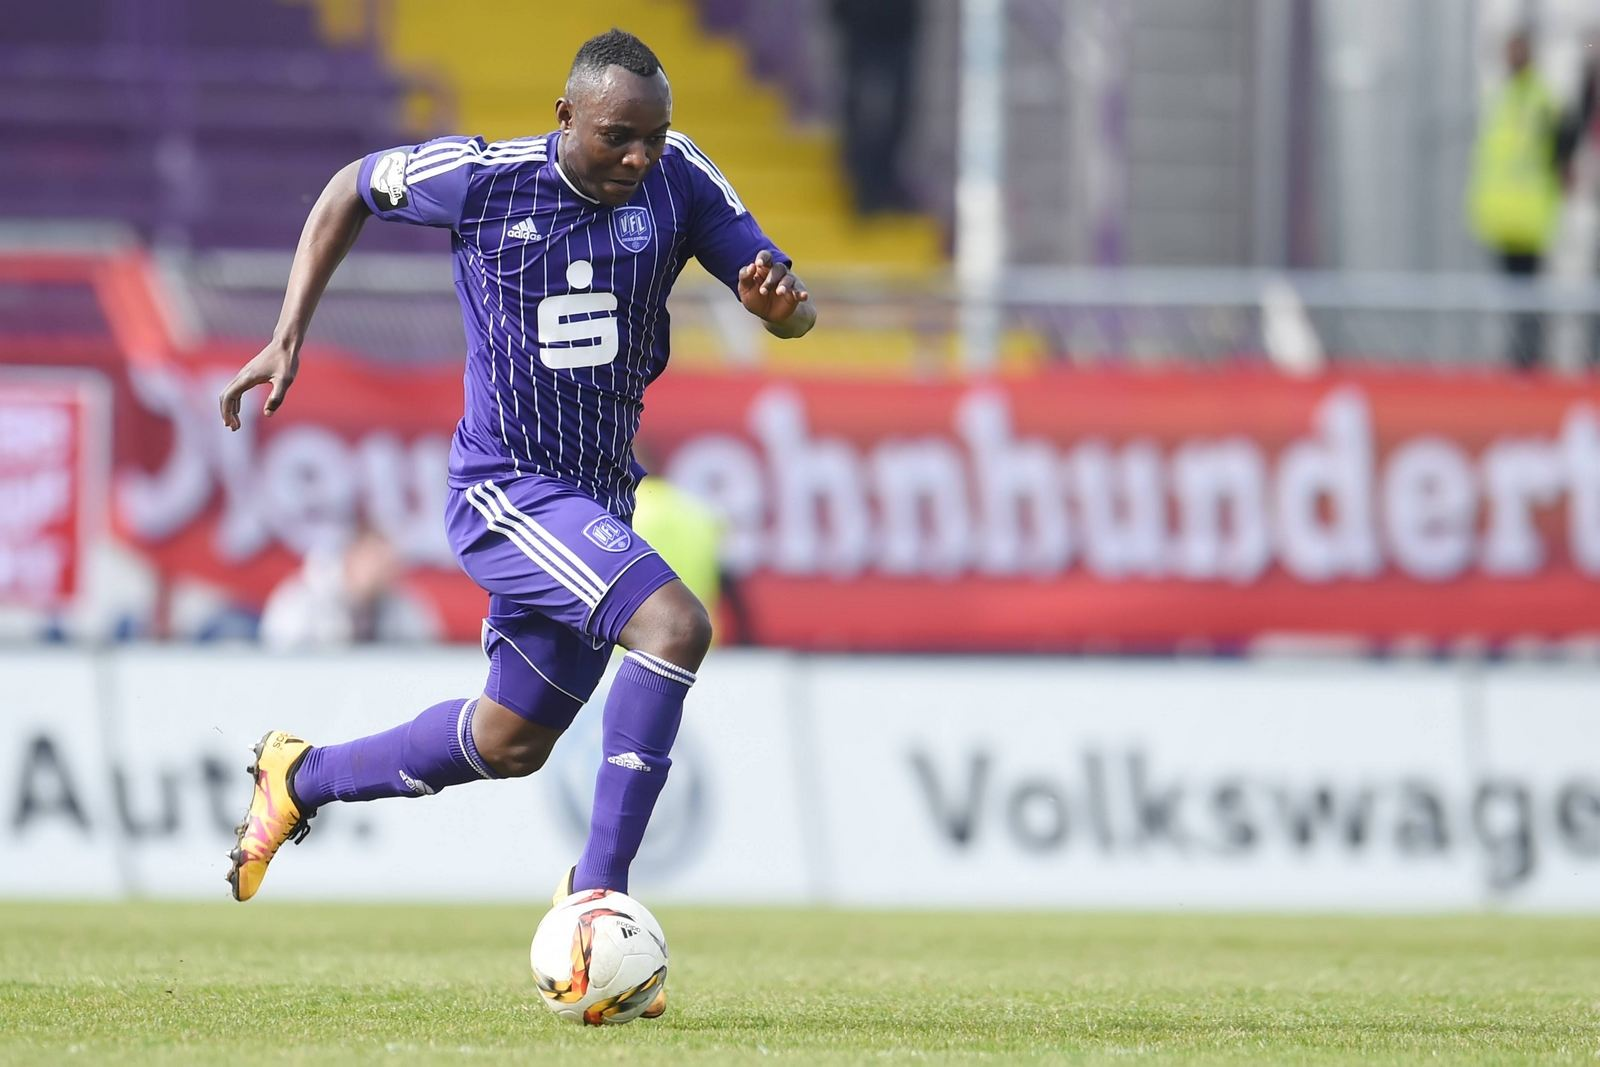 Addy Menga vom VfL Osnabrück im Sprint.